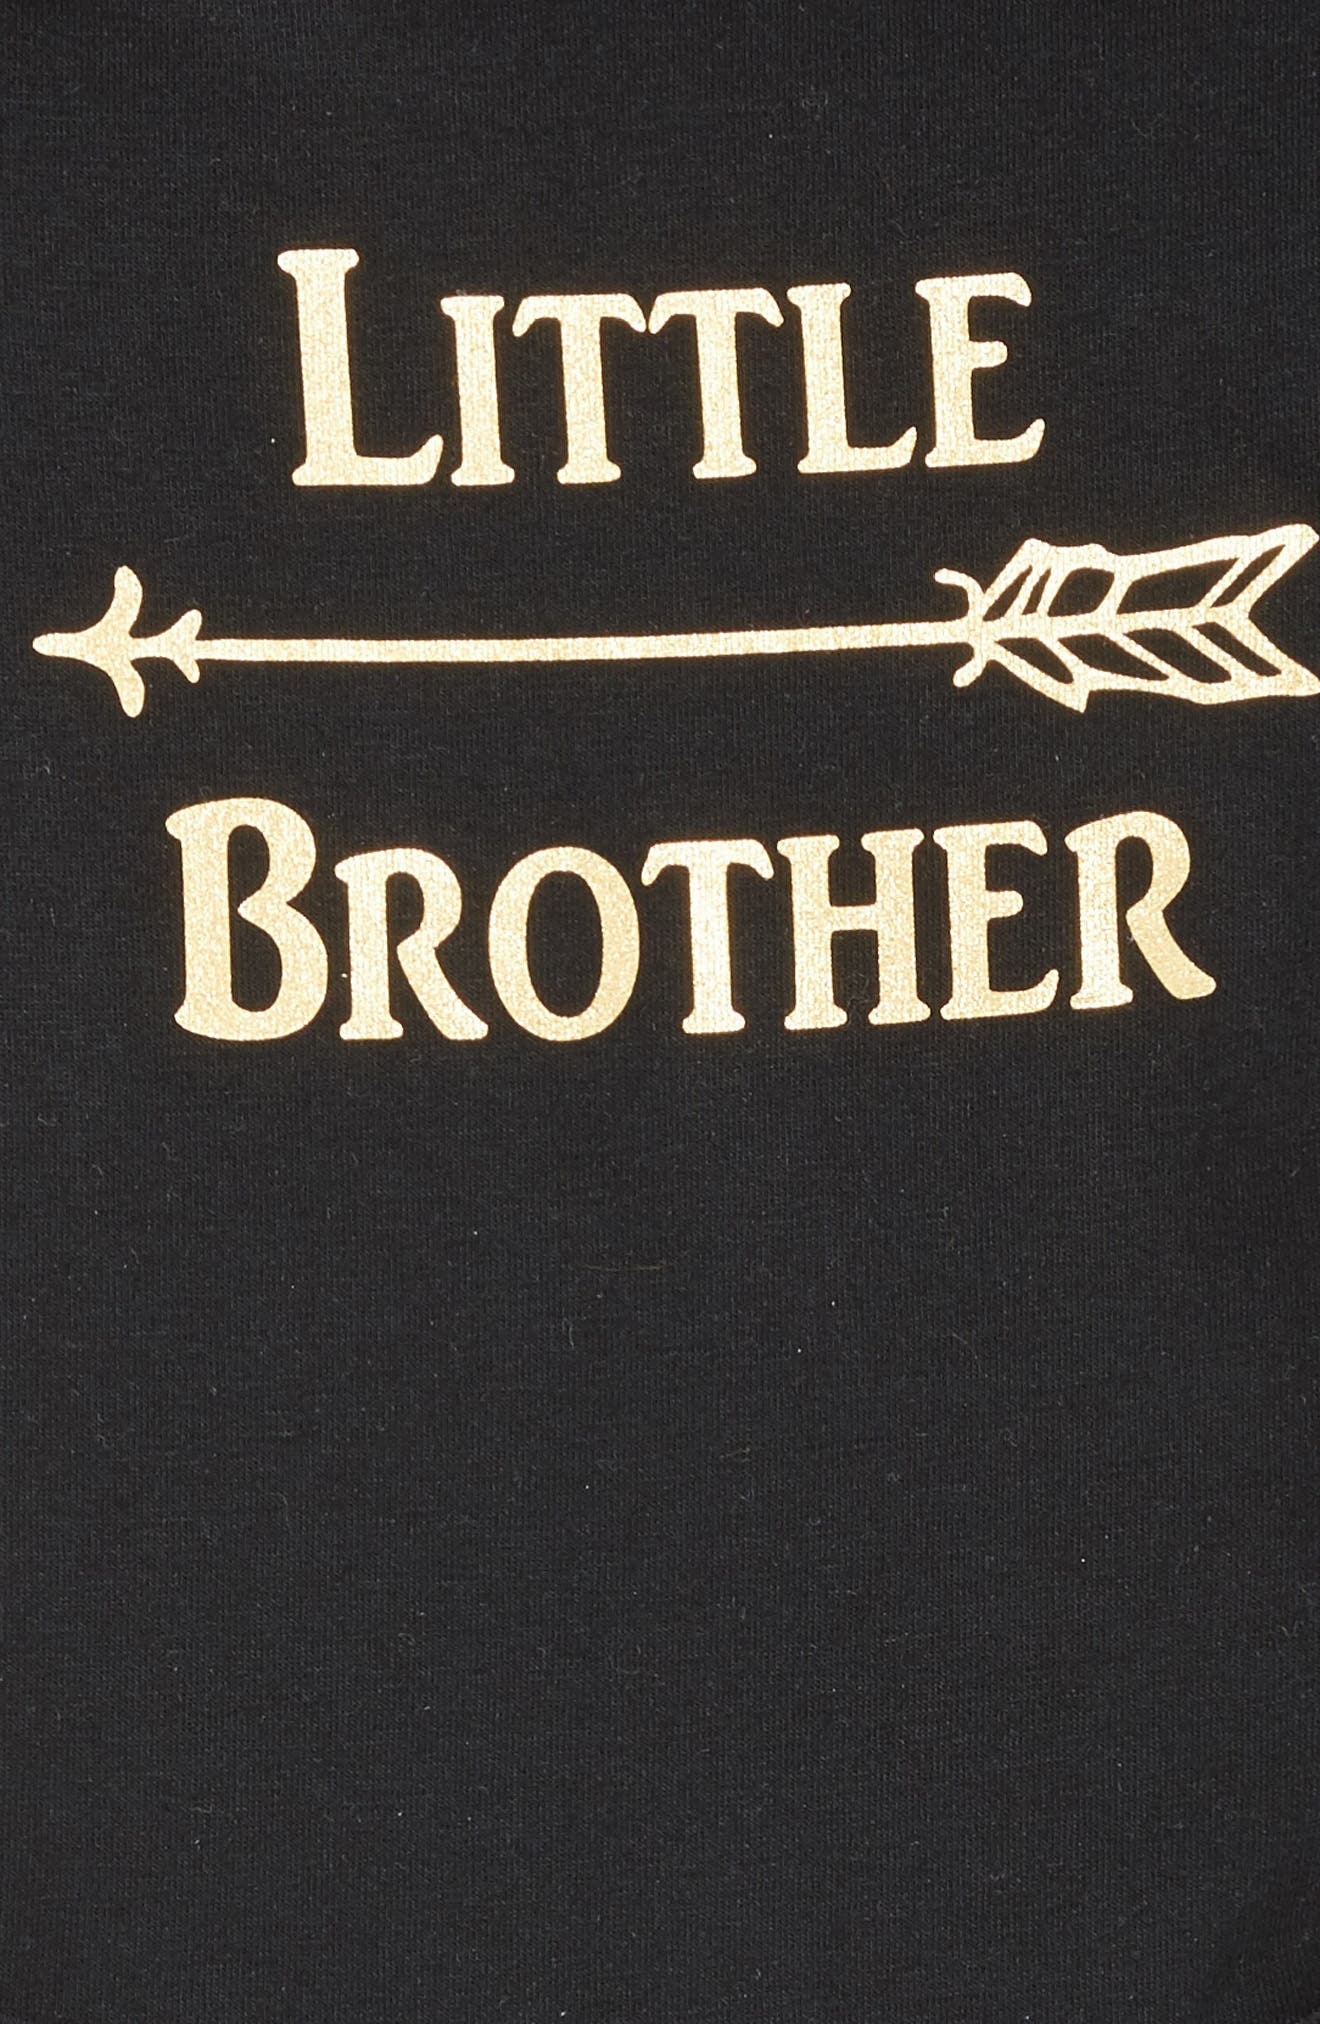 Little Brother Bodysuit,                             Alternate thumbnail 2, color,                             BLACK